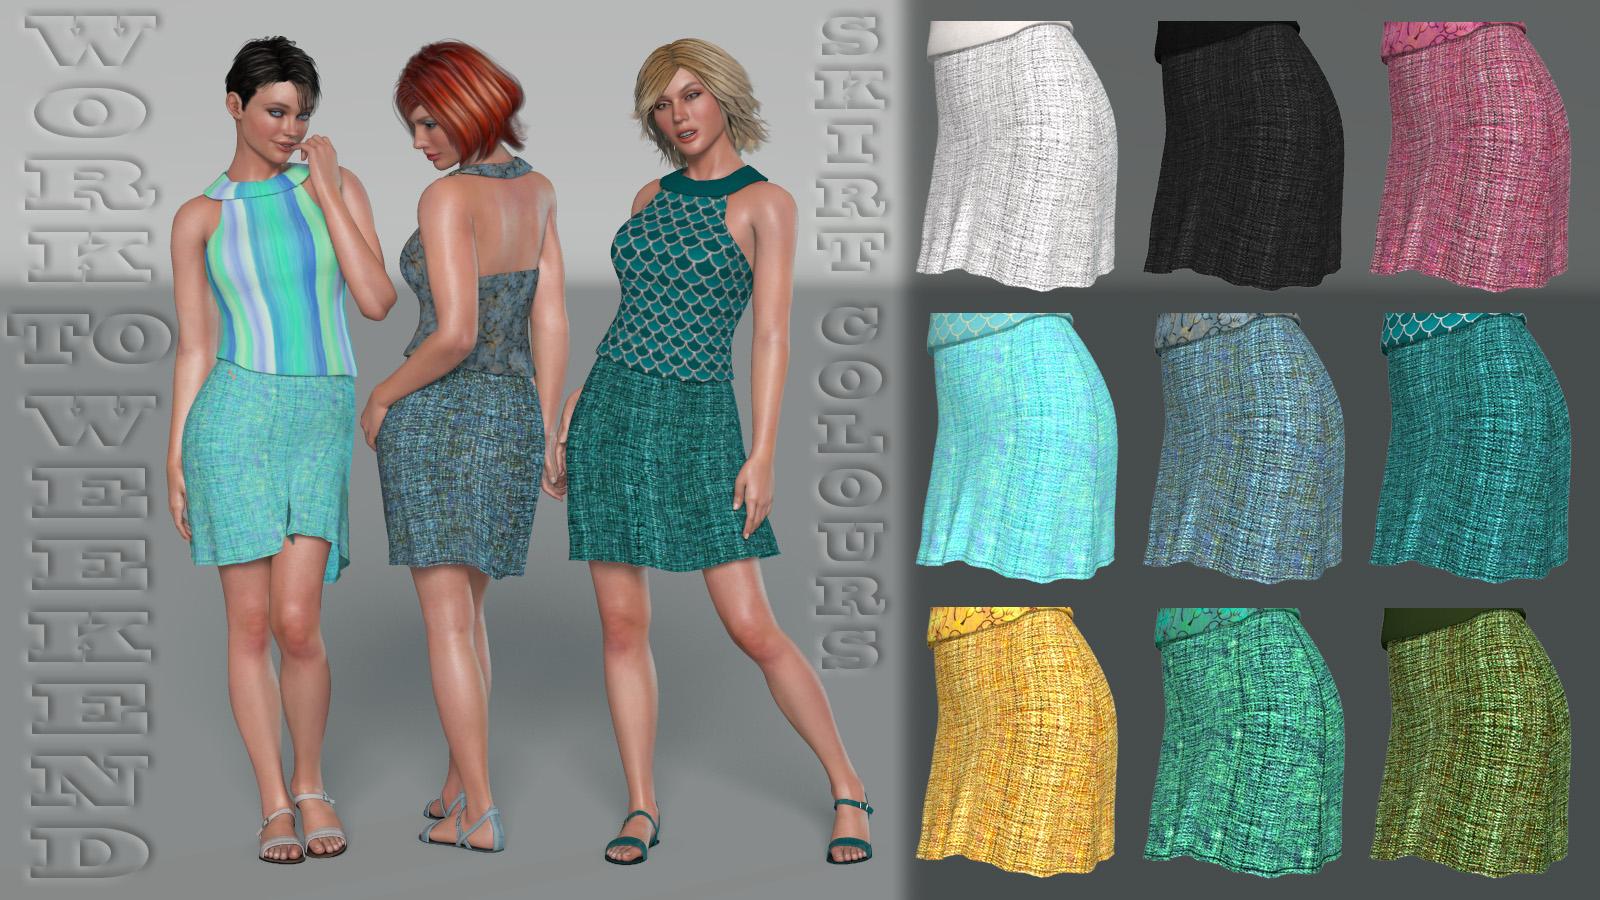 WtoW_Basics5_Skirts.jpg